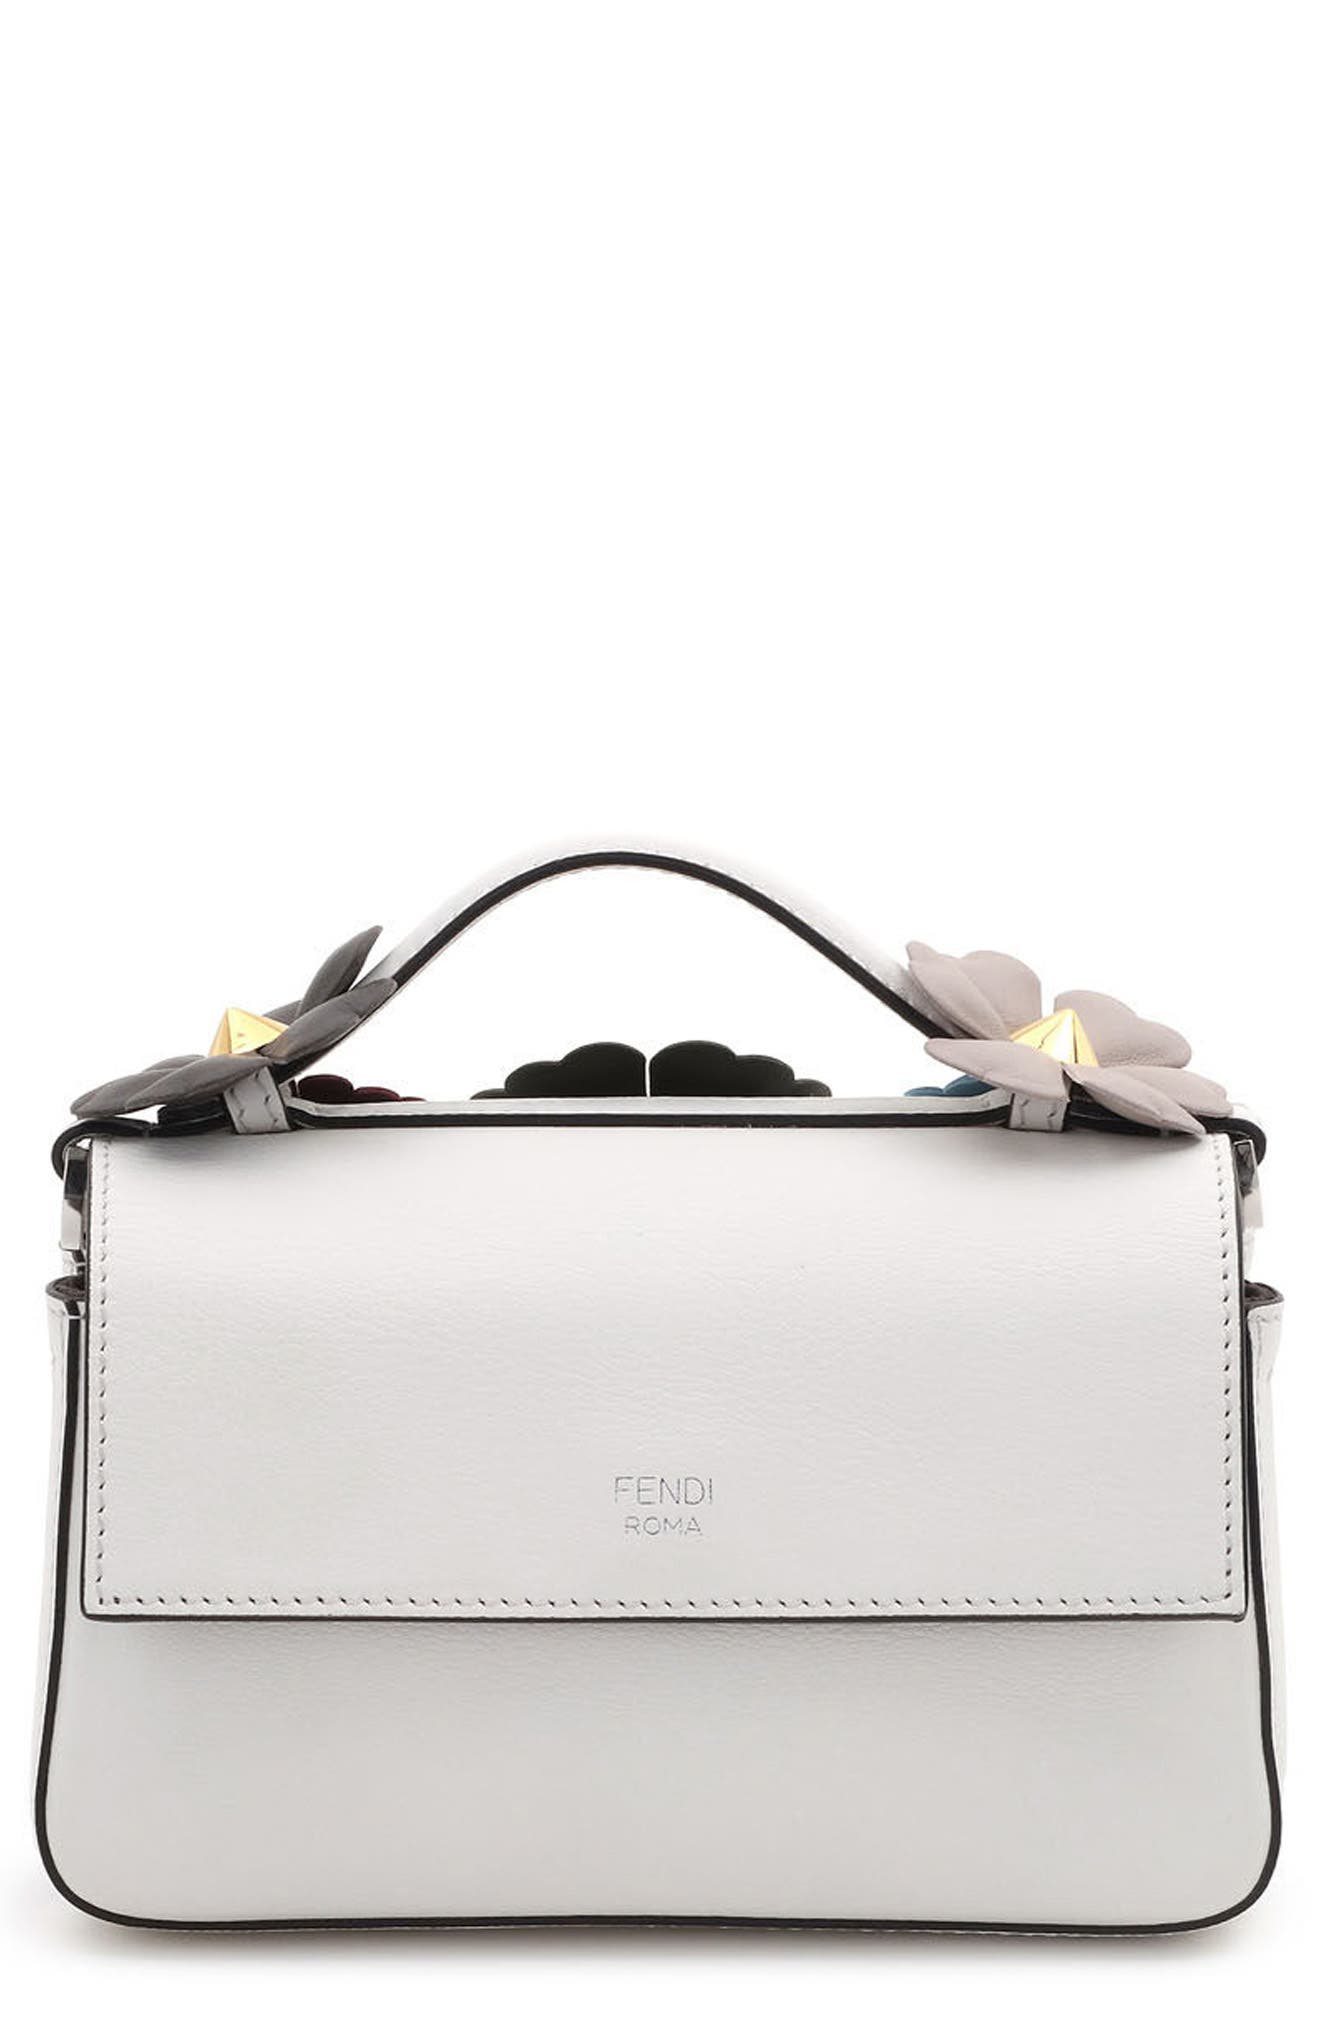 Fendi Flowerland Double Micro Baguette Leather Satchel